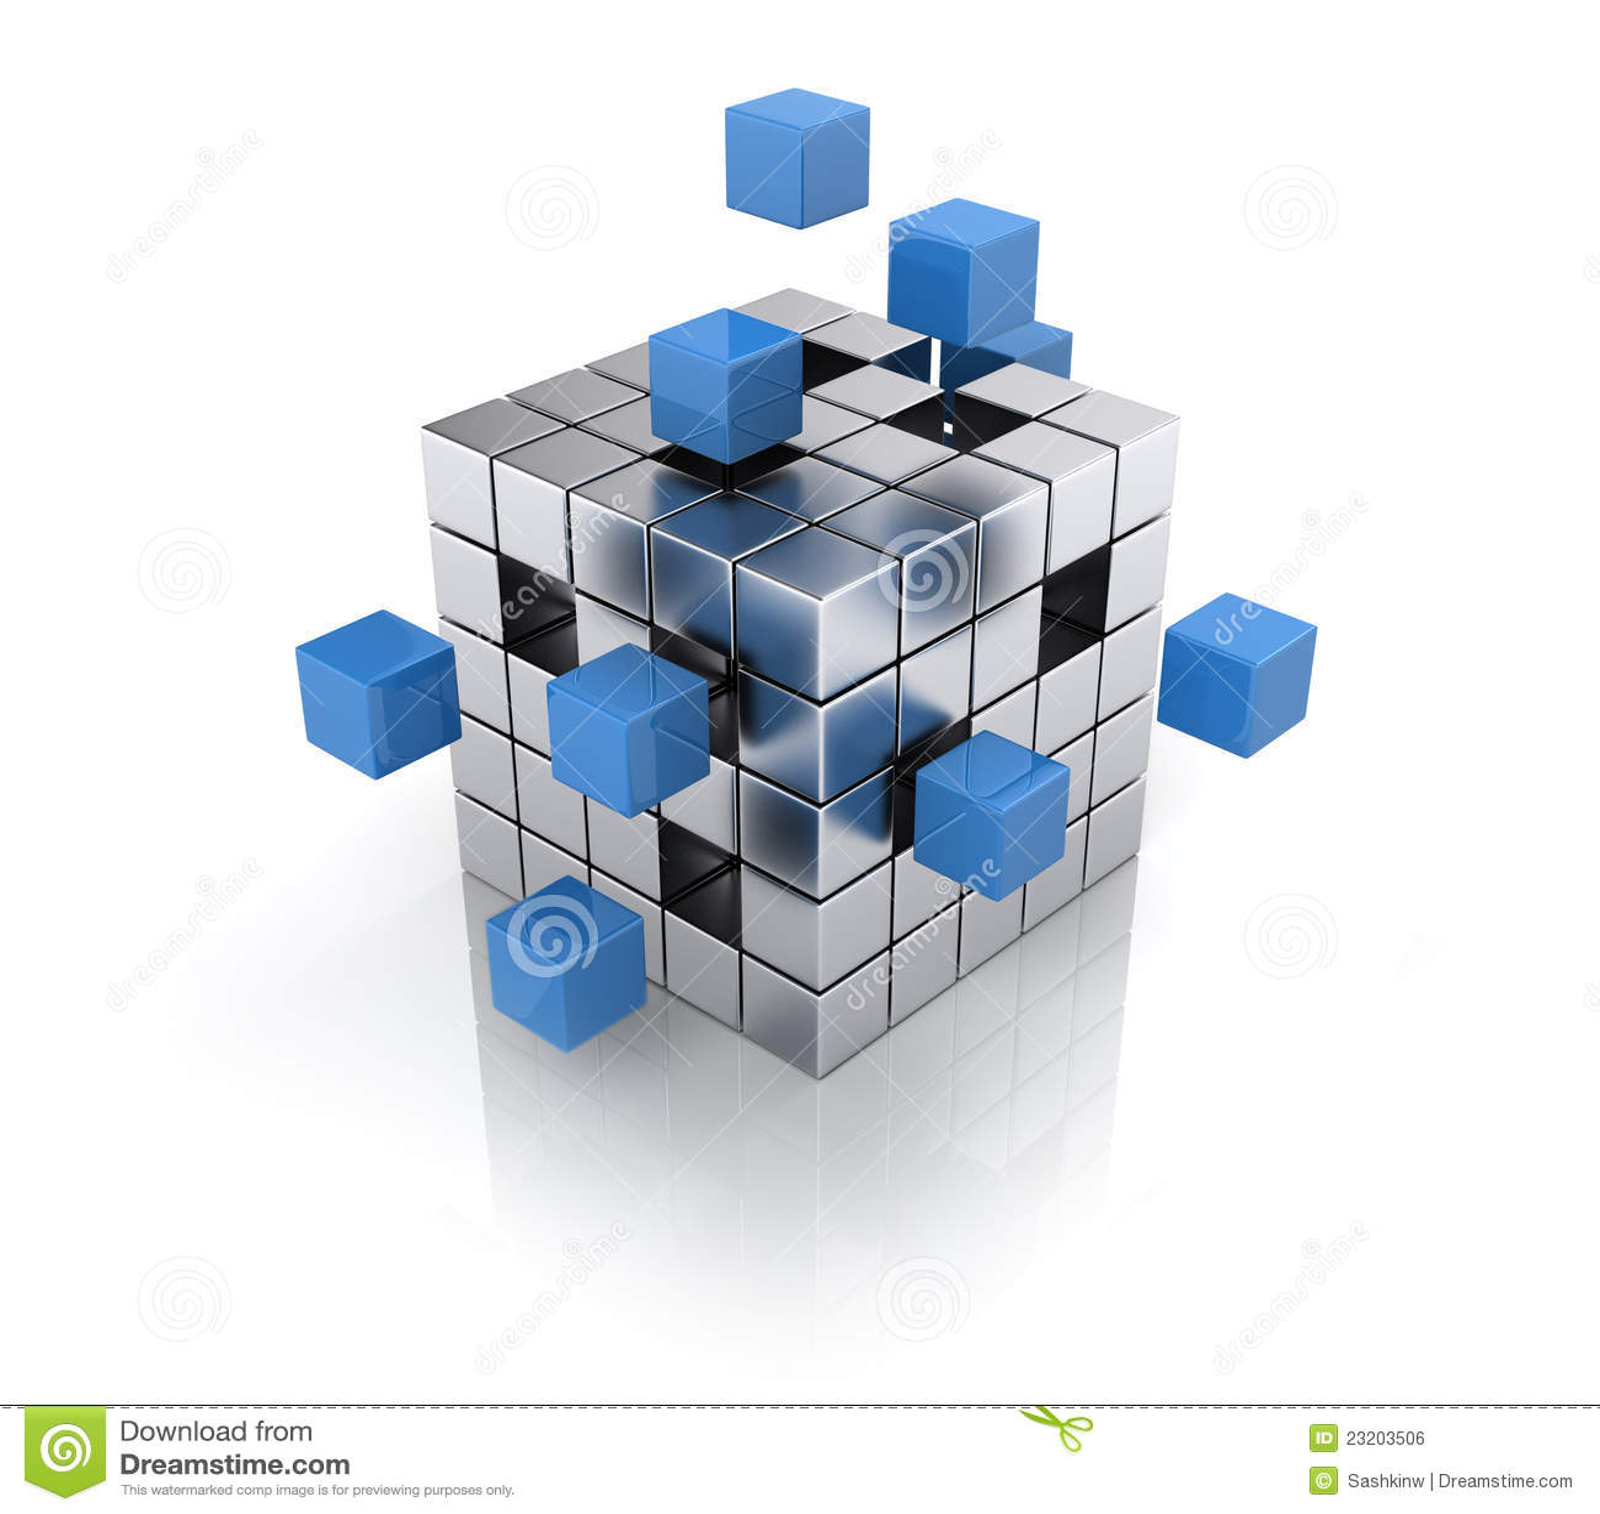 assembling cube structure stock illustration illustration of